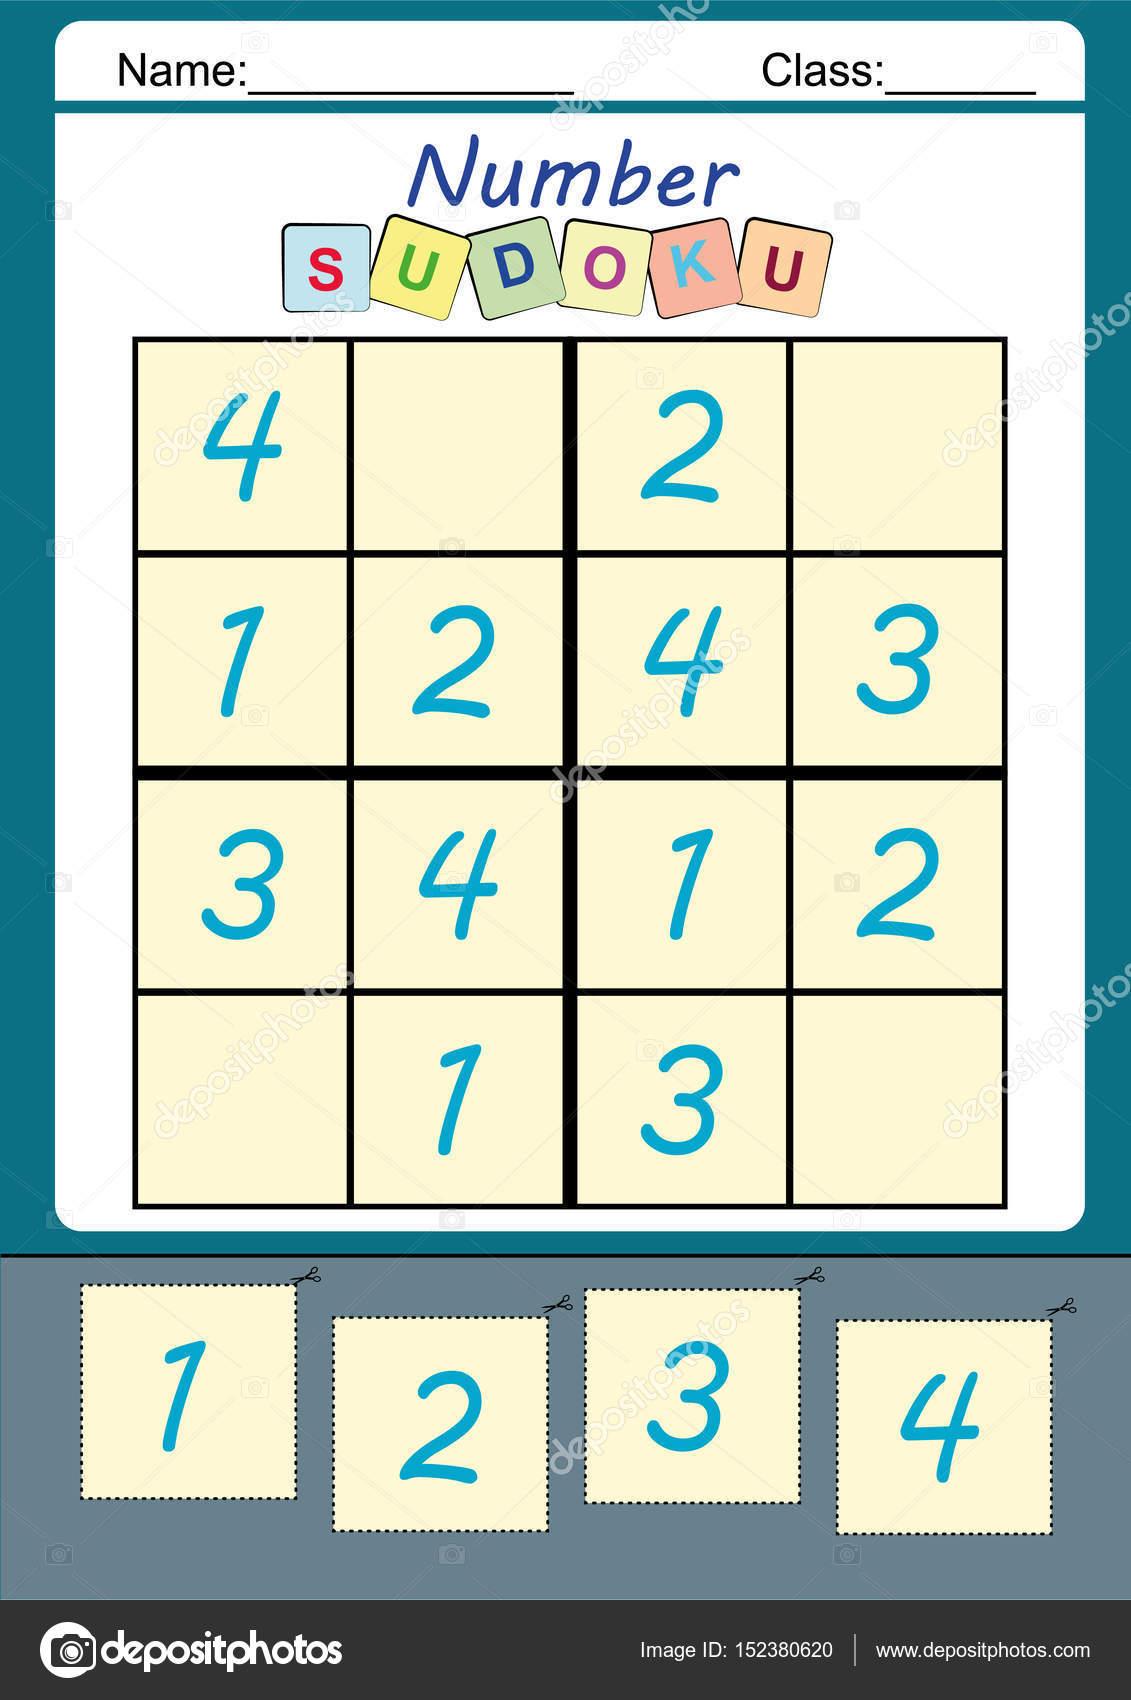 Lustiges Bild-Sudoku für Kinder — Stockfoto © kamilon #152380620